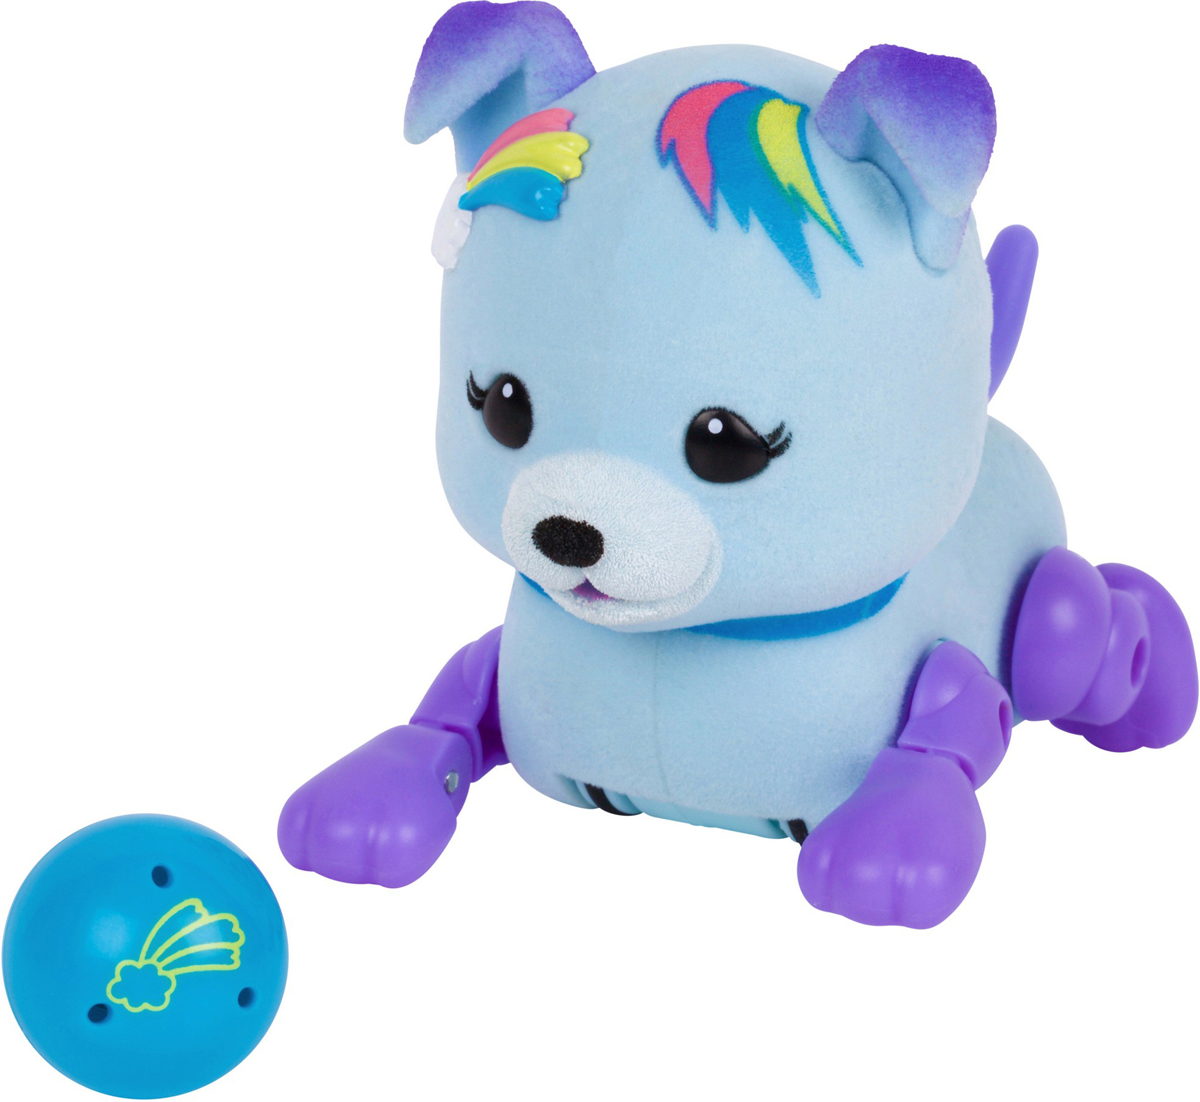 Moose Интерактивная игрушка Little Live Pets Щенок Звездочка с мячиком - Интерактивные игрушки